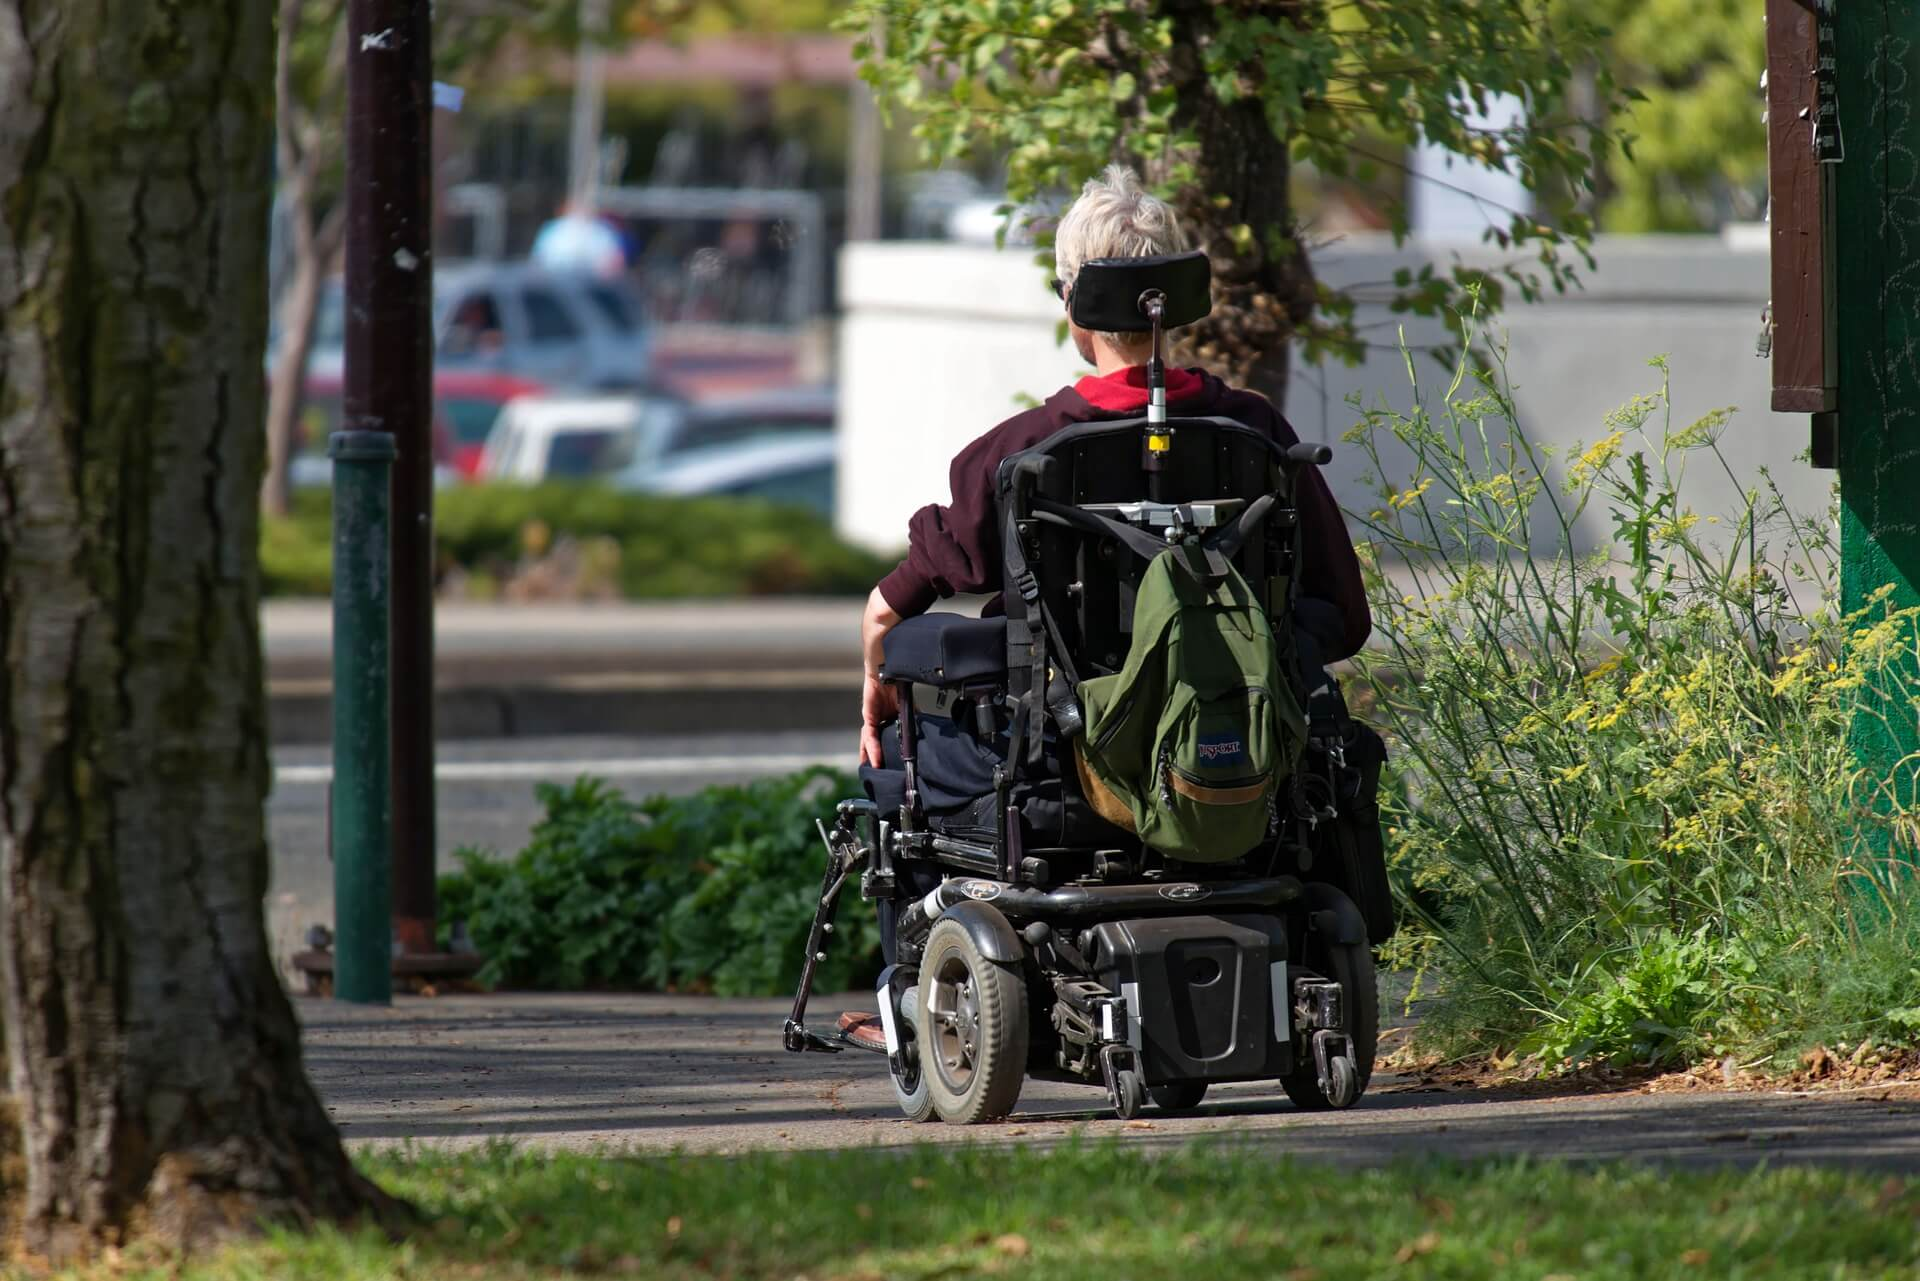 Batterie fauteuil roulant Bourgoin-Jallieu